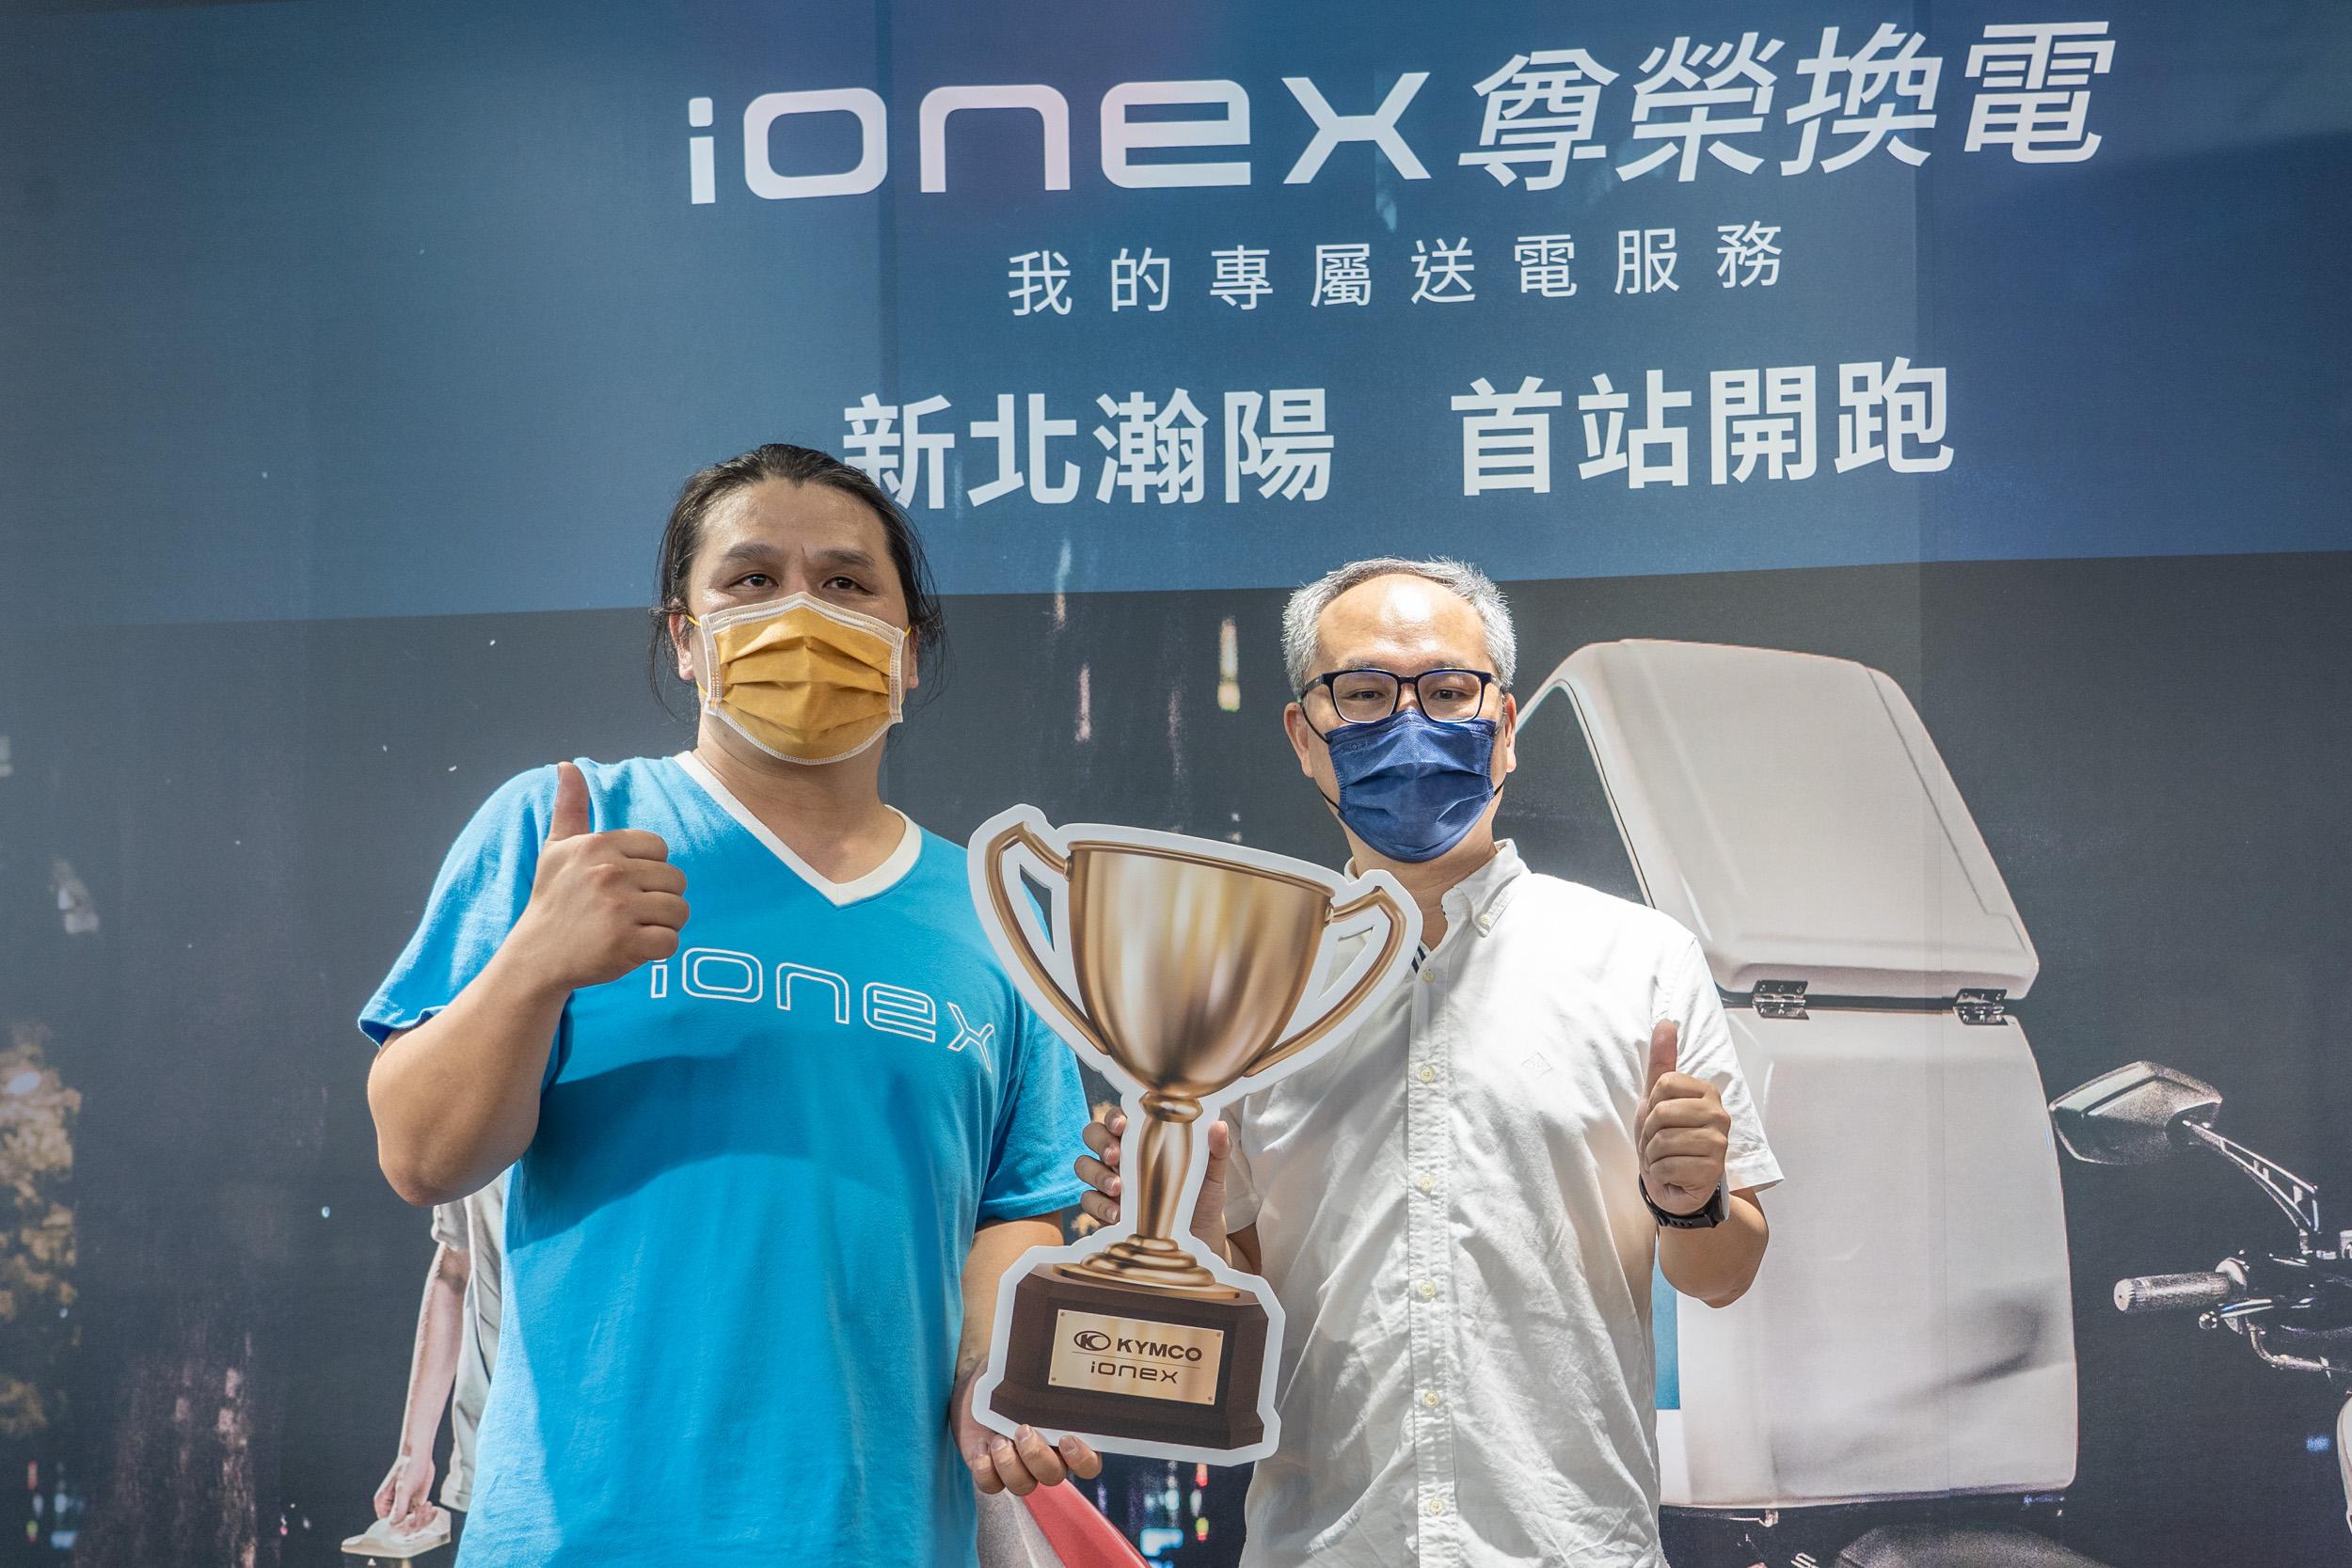 Ionex新北瀚陽店為目前全台Ionex 3.0車款銷售冠軍的經銷點。